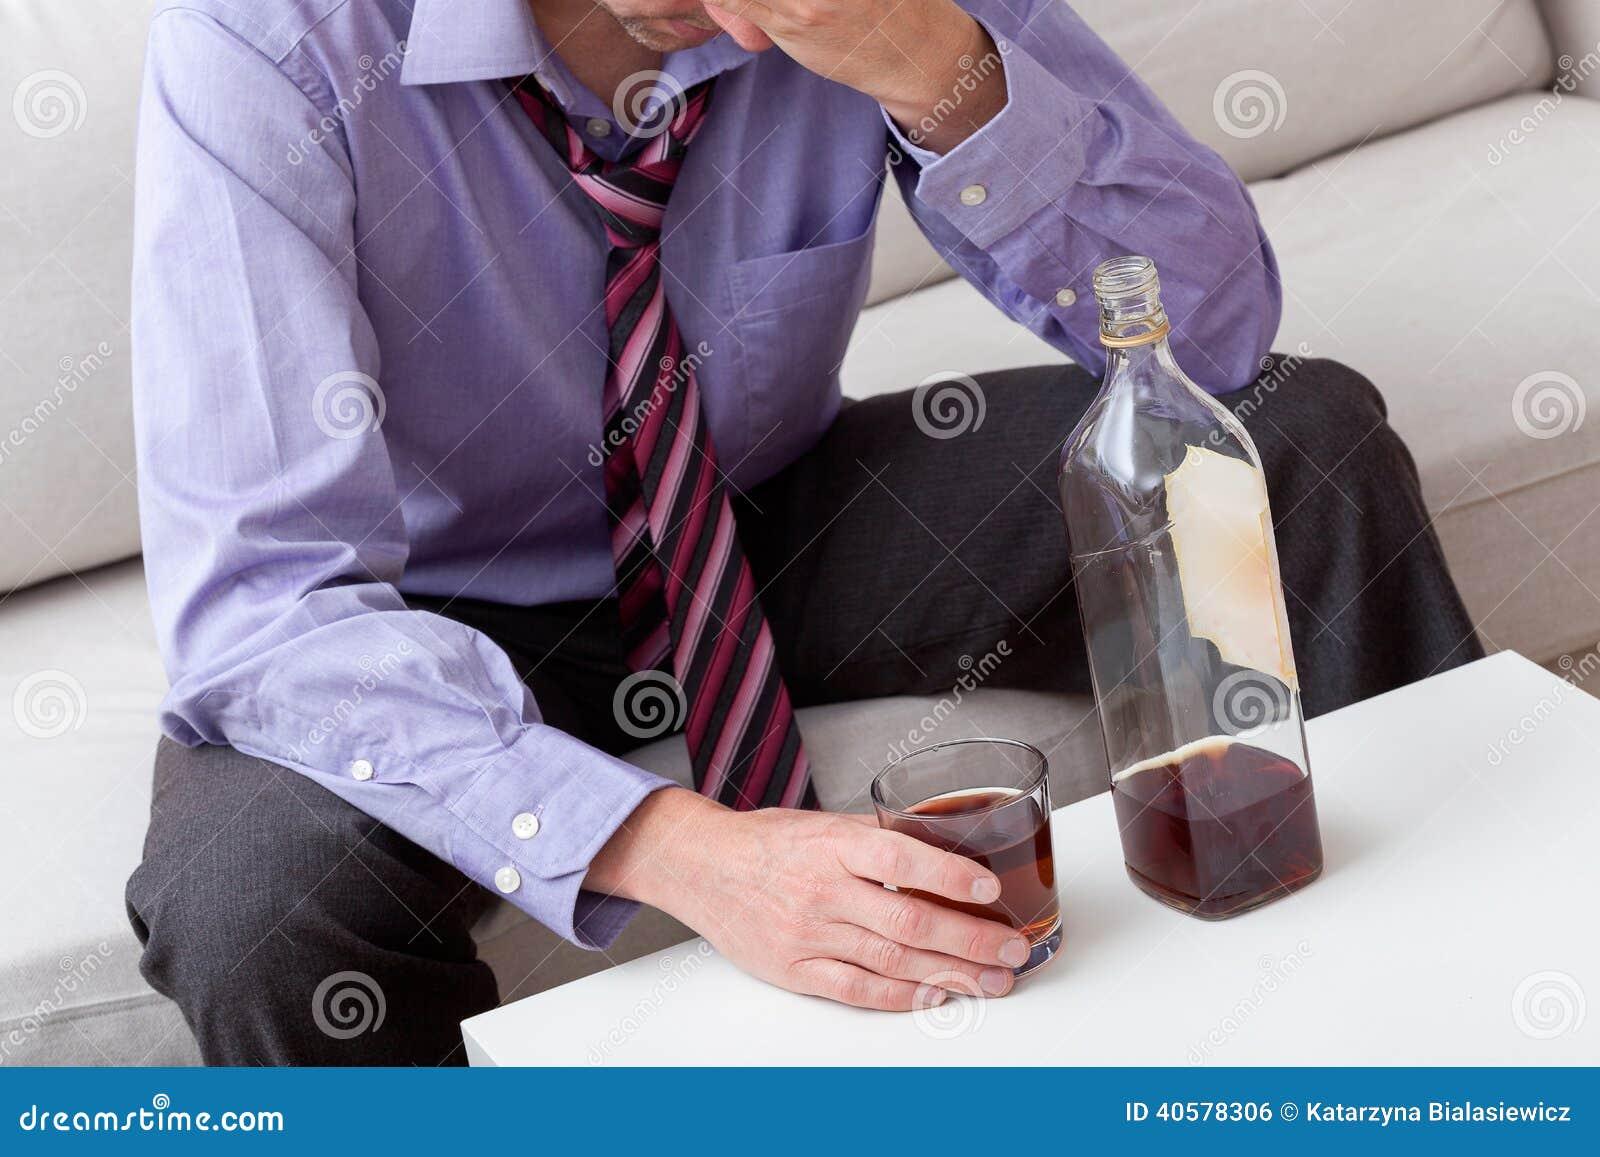 Человек с проблемами спирта